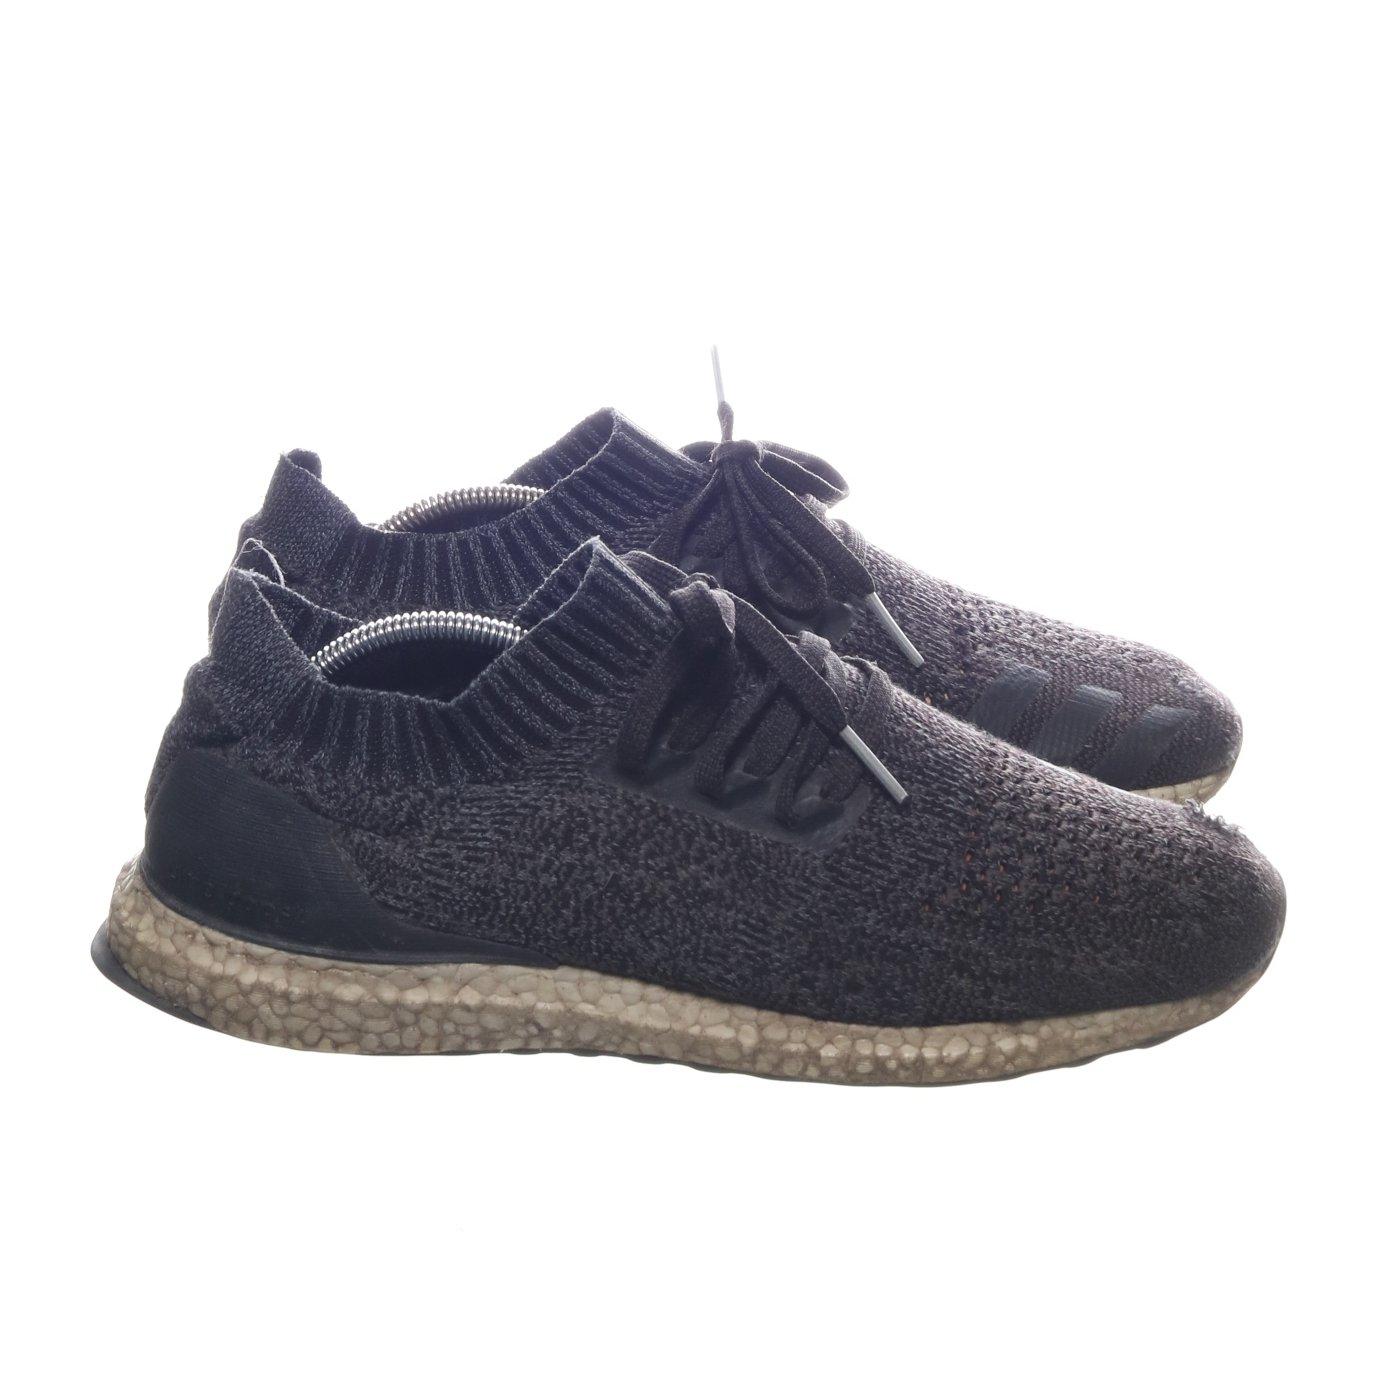 low priced 1b372 39abe Adidas, Löparskor, Strl: 44 2/3, Ultraboo.. (354734012) ᐈ ...